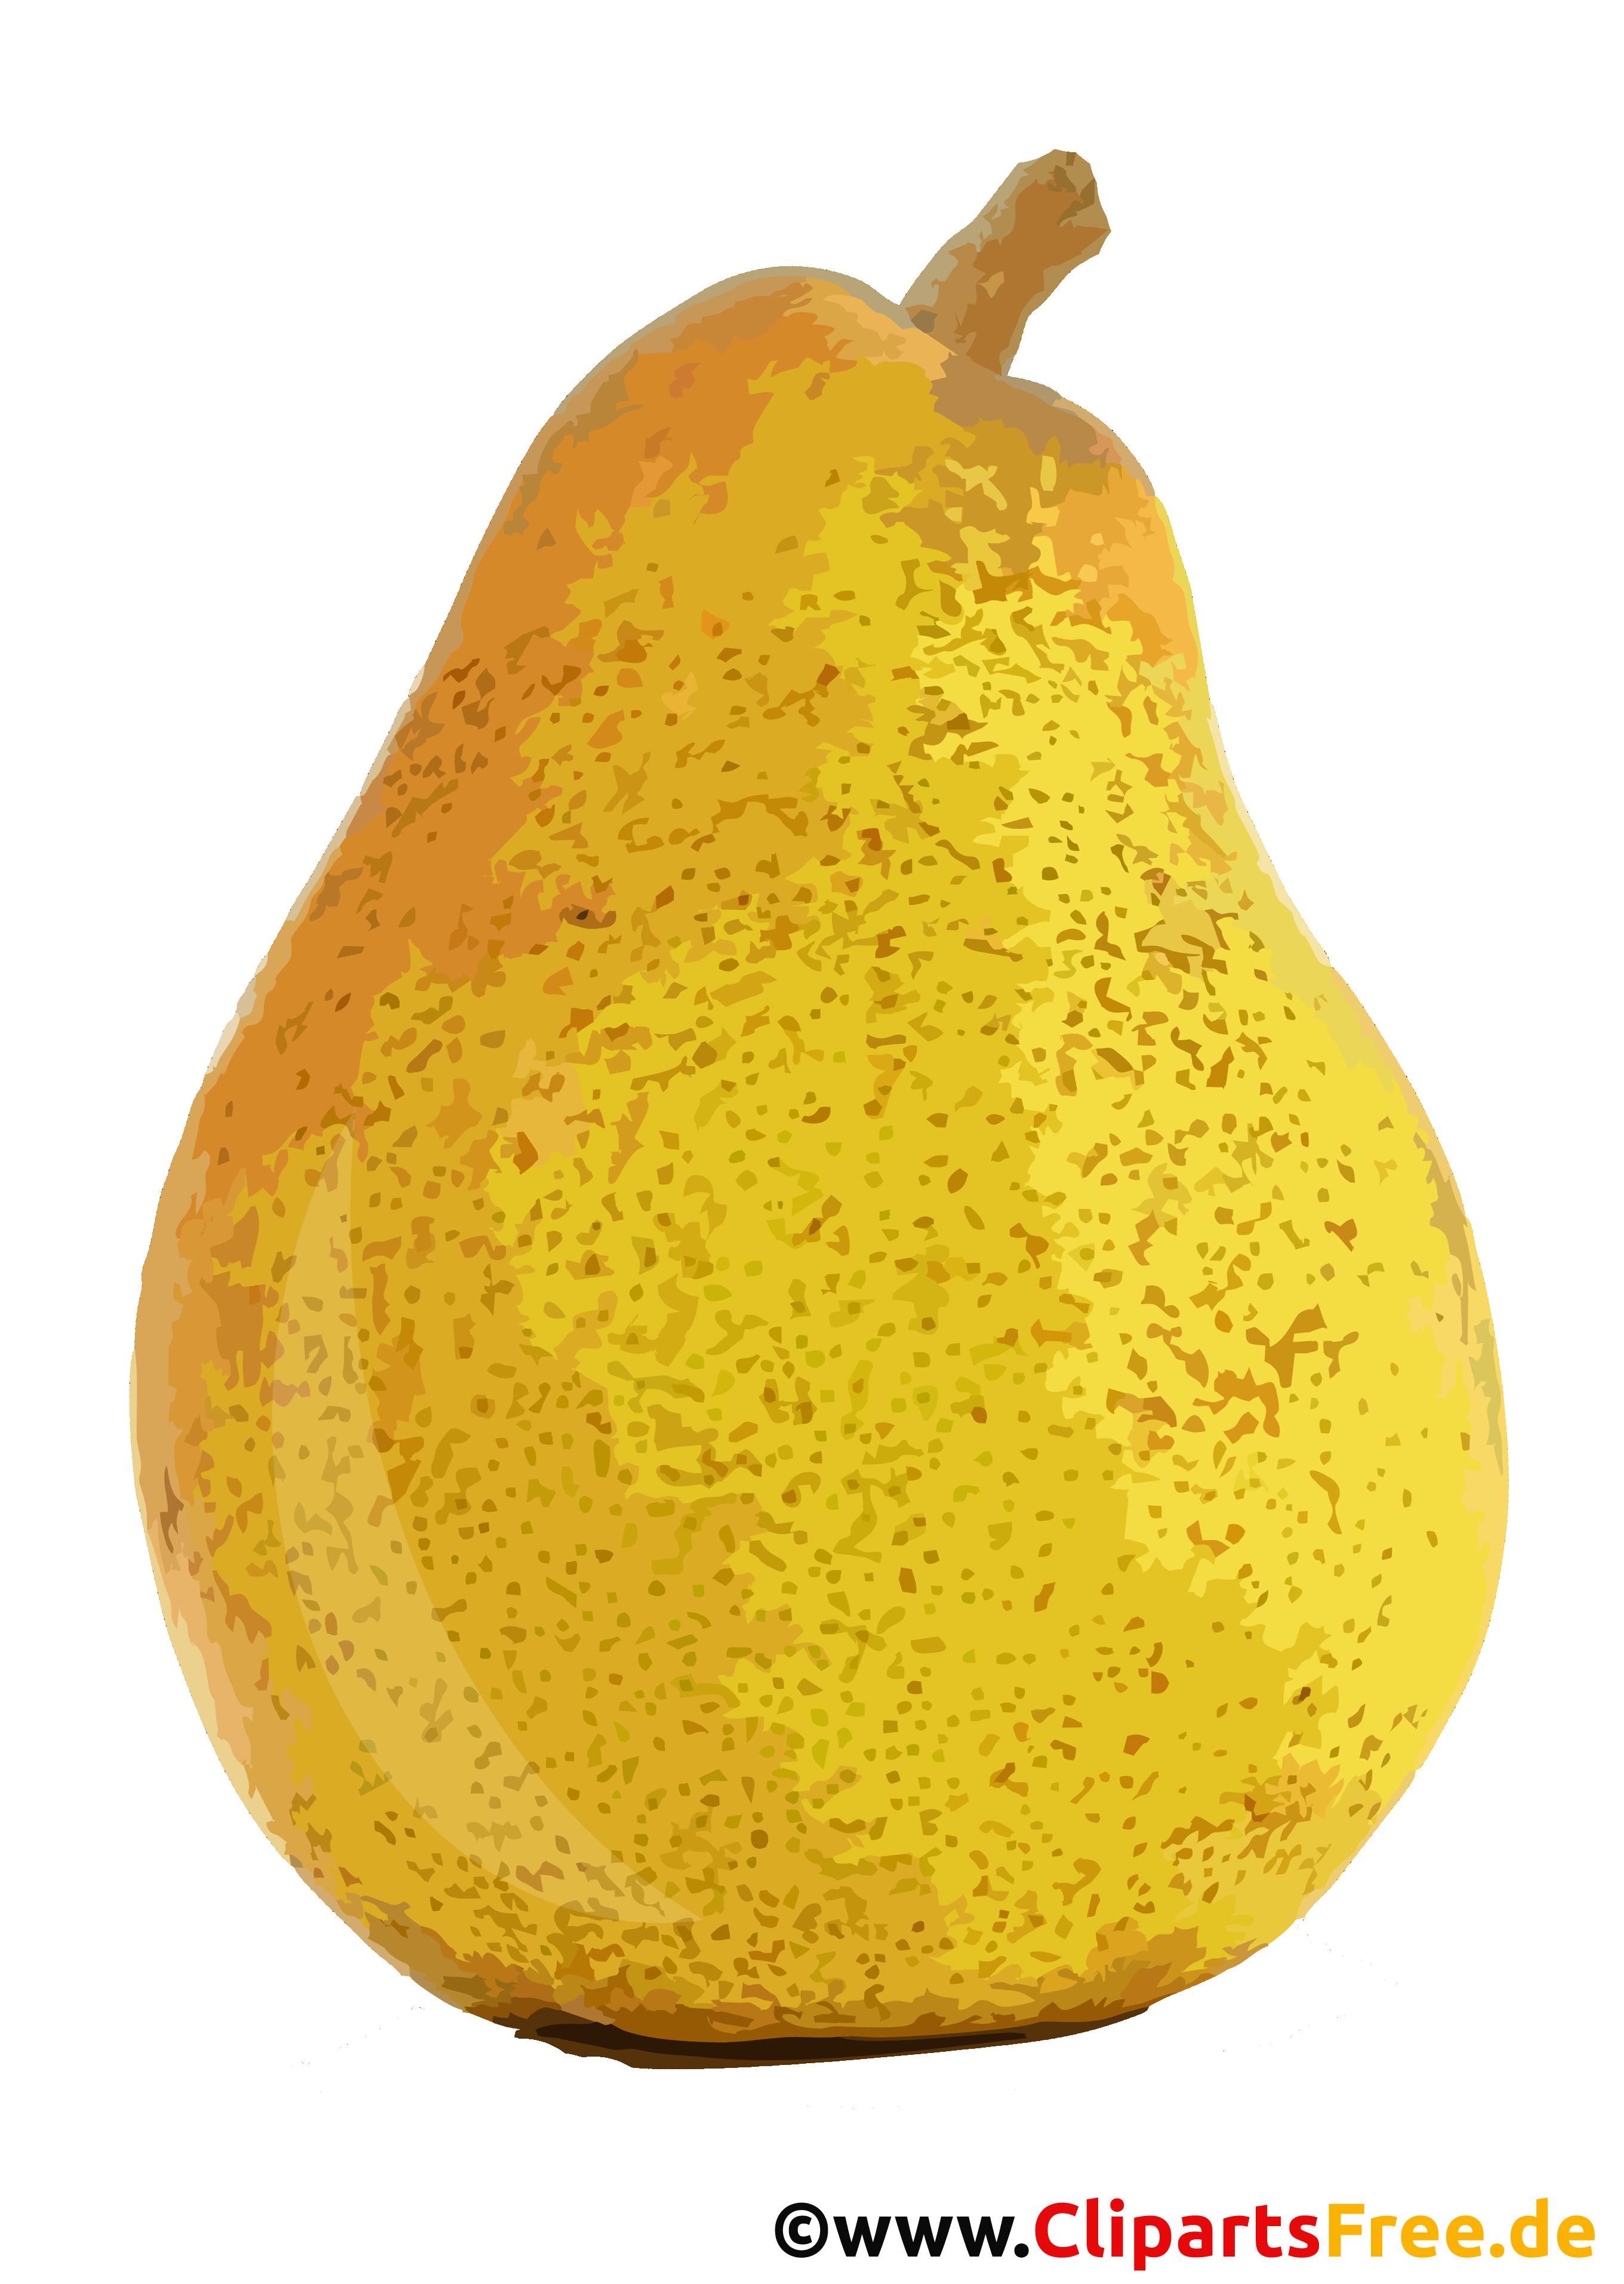 Gelbe Birne Clipart, Illustration, Bild transparent